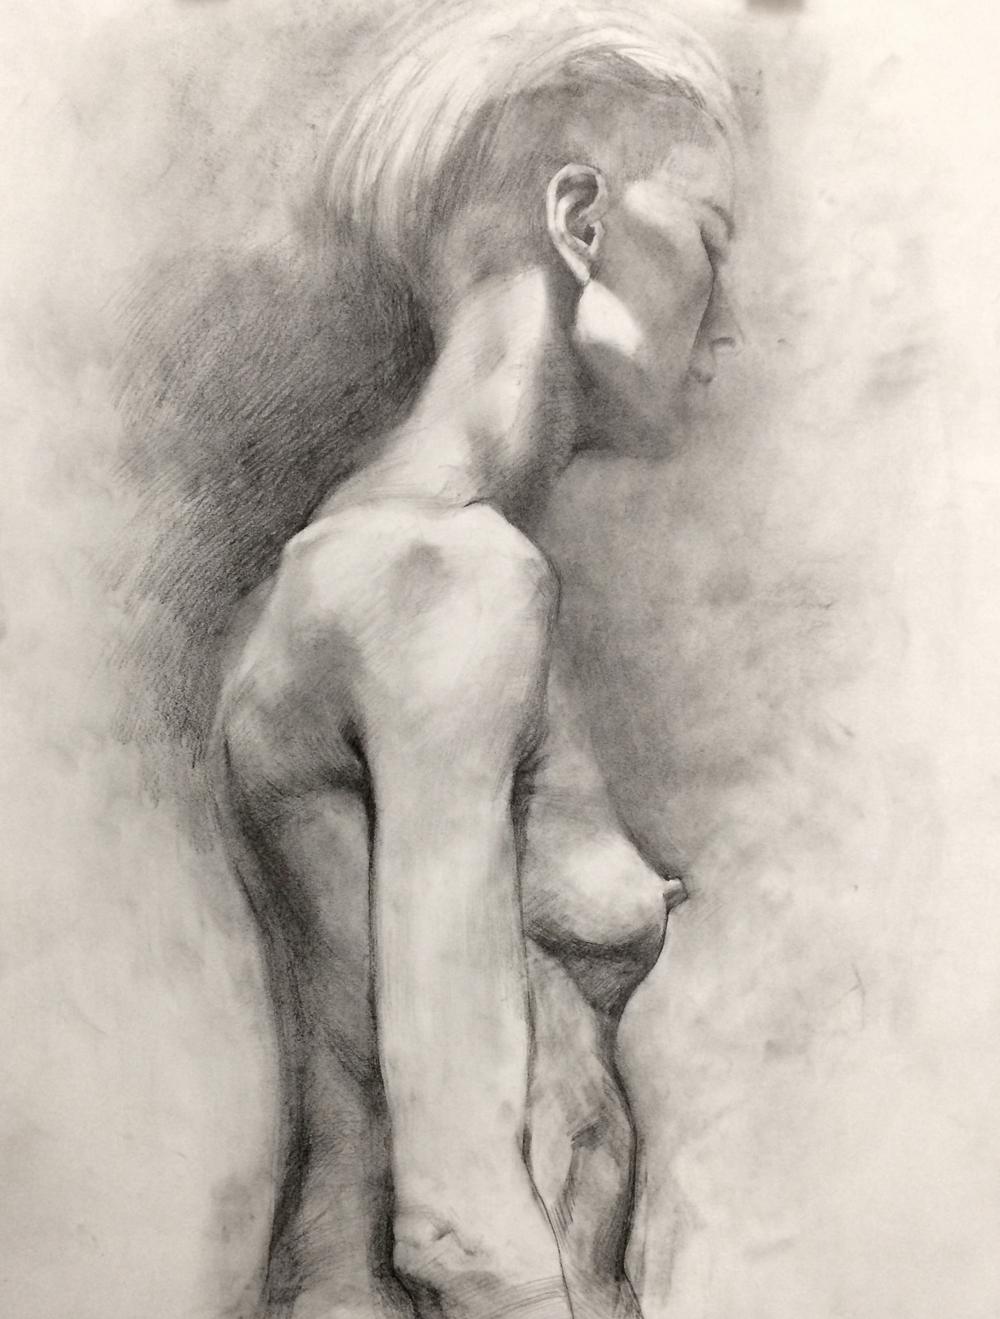 Woman Figure : 18x24 : Charcoal : 2015.jpg